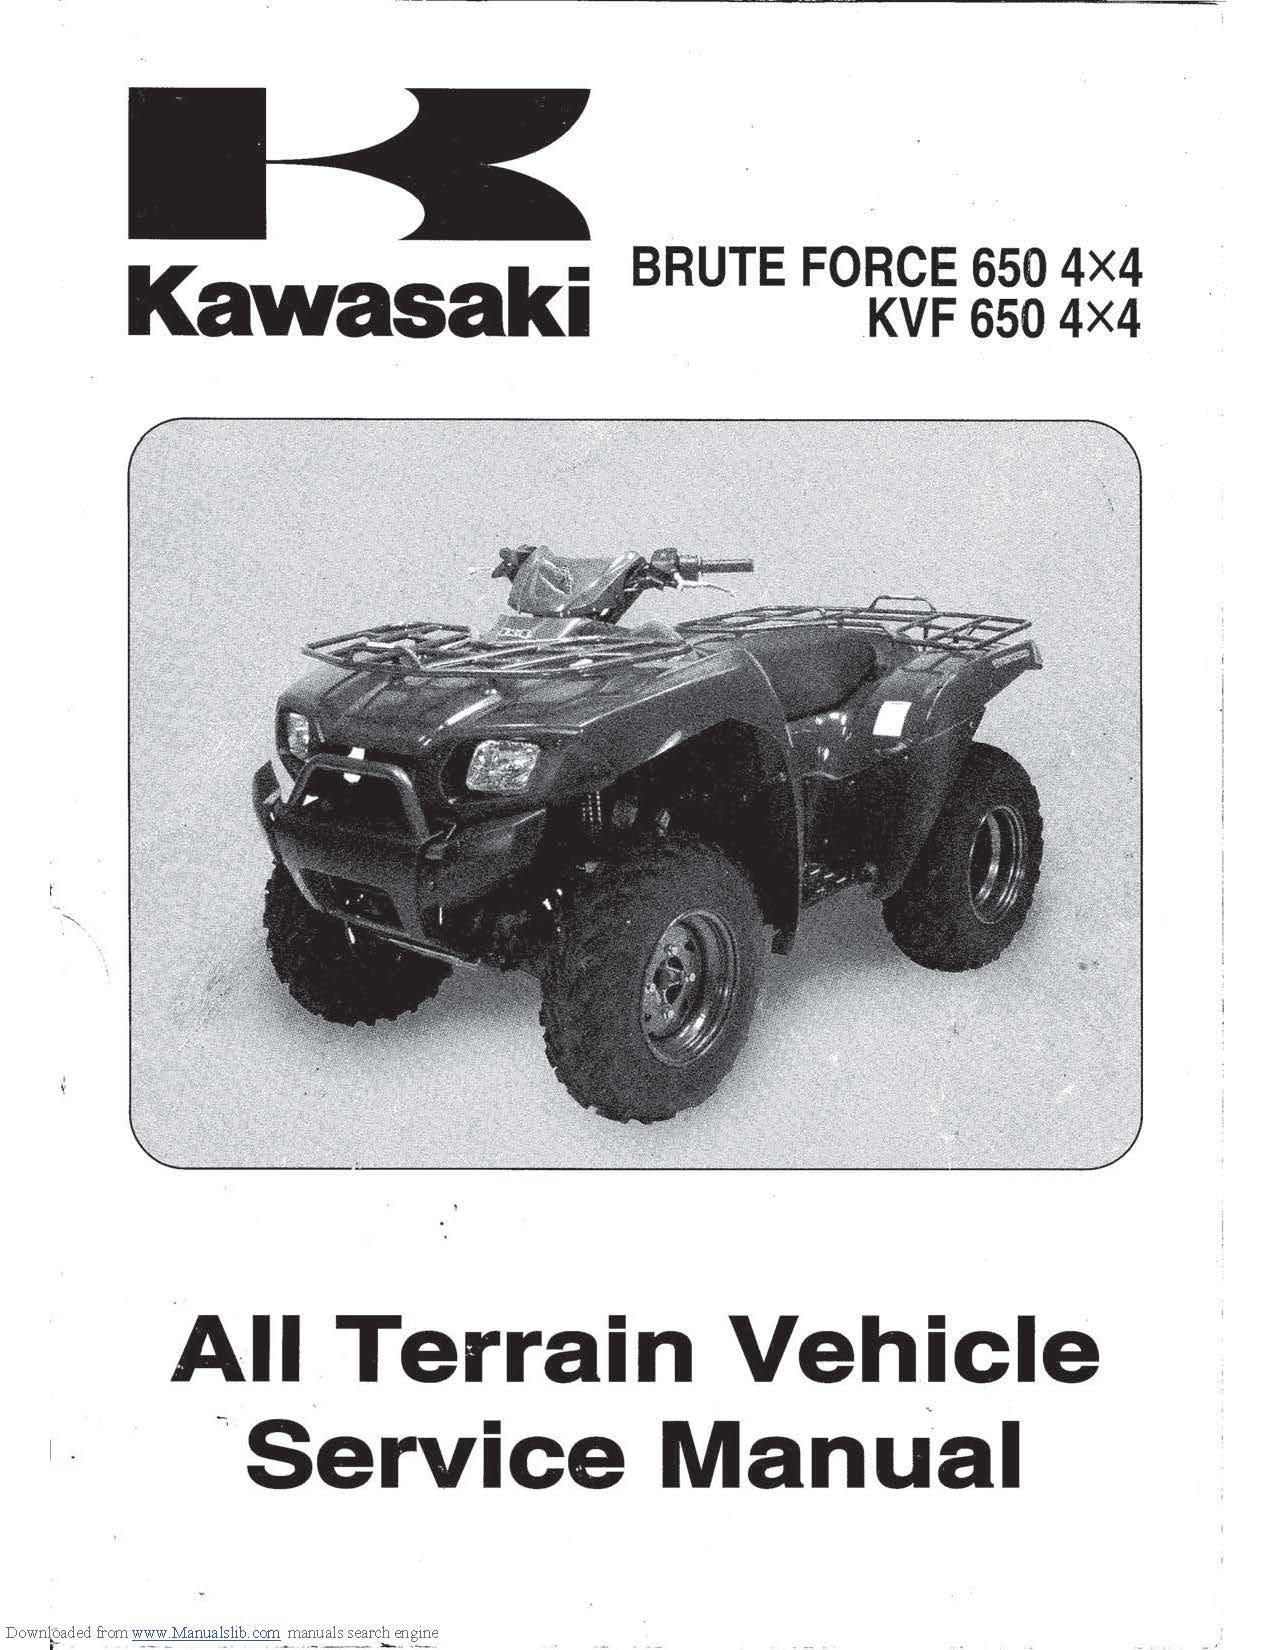 Brute Force 650 SRA KVF-650 Service Manual 2005